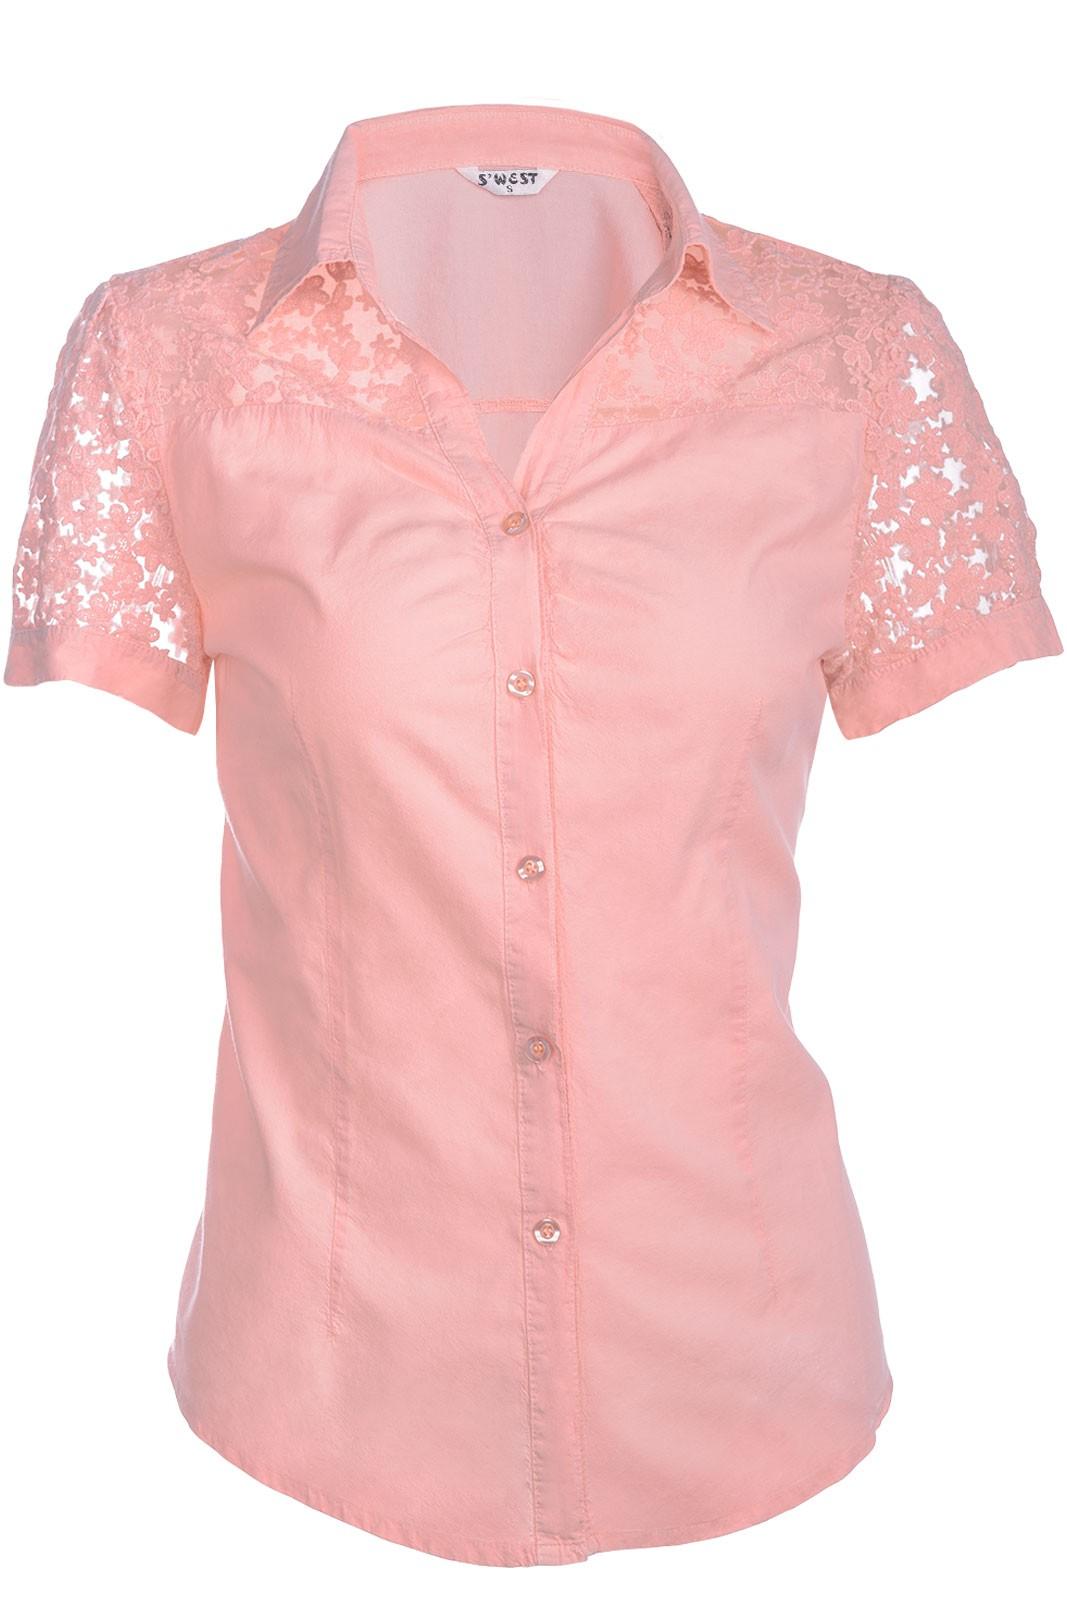 damen bluse sommer hemd tunika v ausschnitt kurzarm baumwolle t shirt spitze ebay. Black Bedroom Furniture Sets. Home Design Ideas